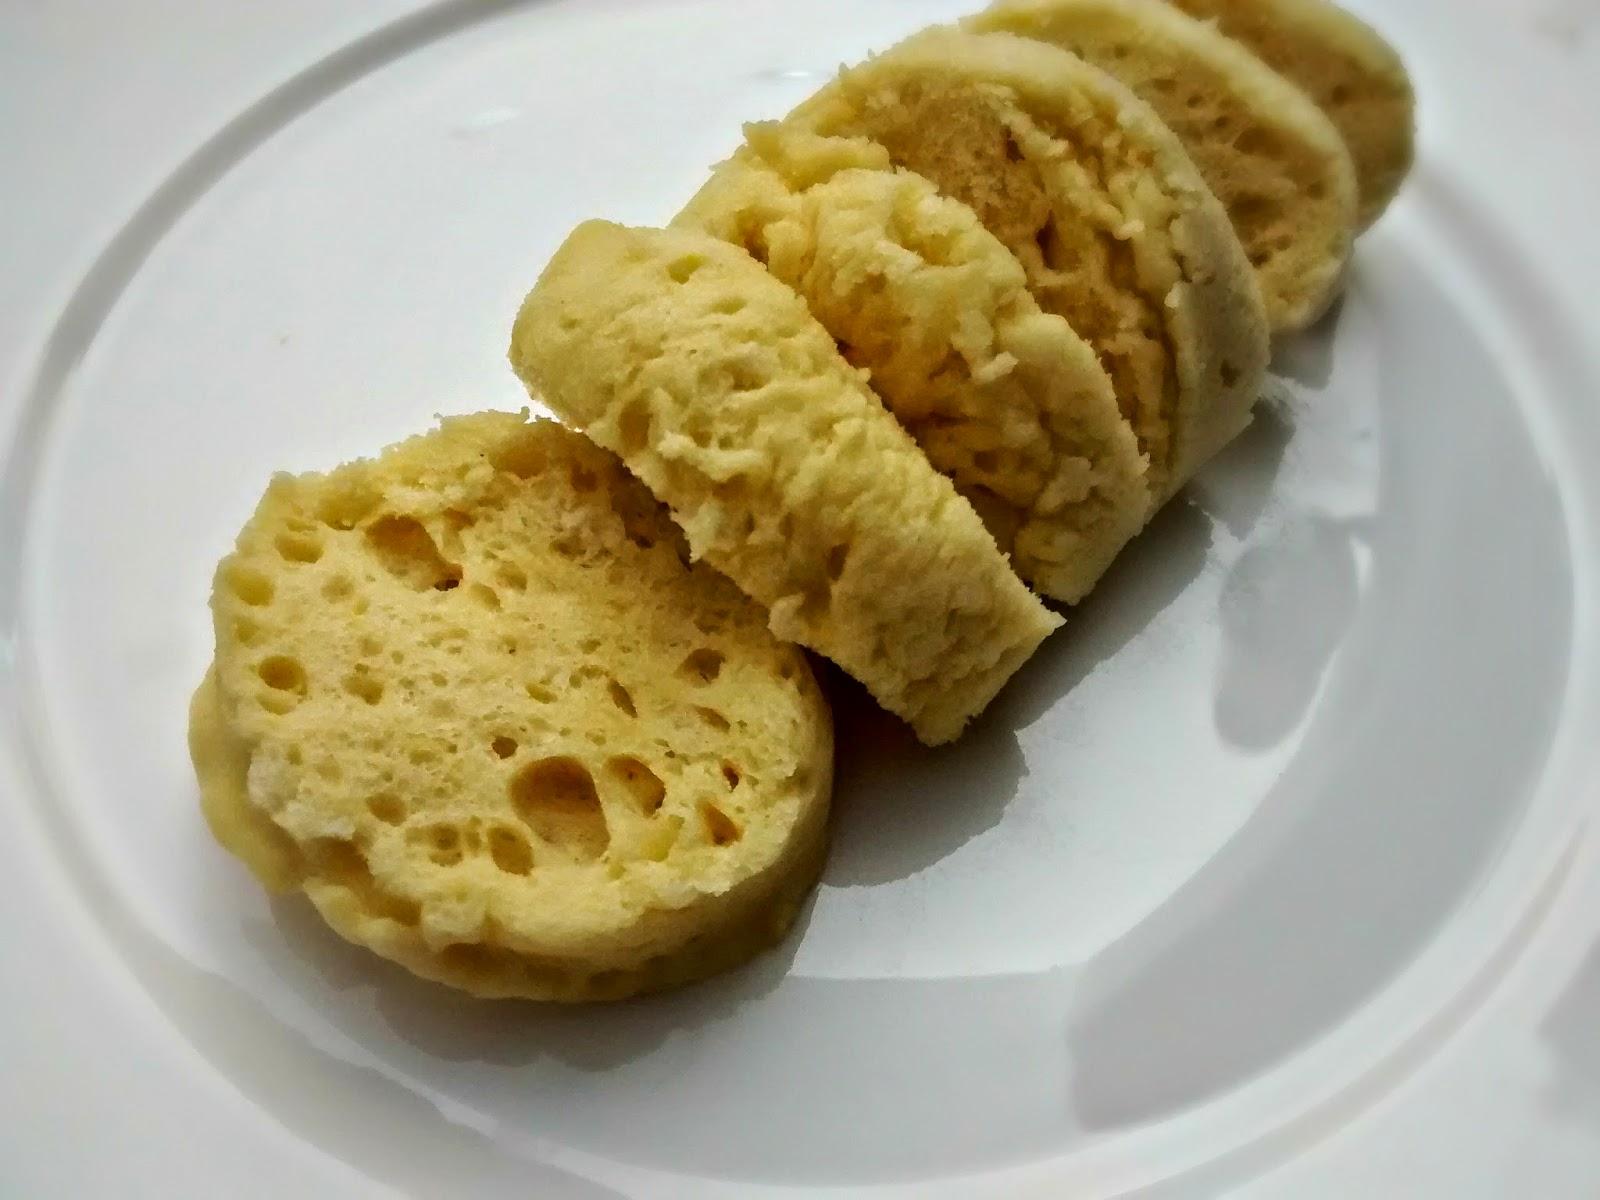 Simply Wright: 10 Simple Muffin, Scone & Mug Cake Recipes!